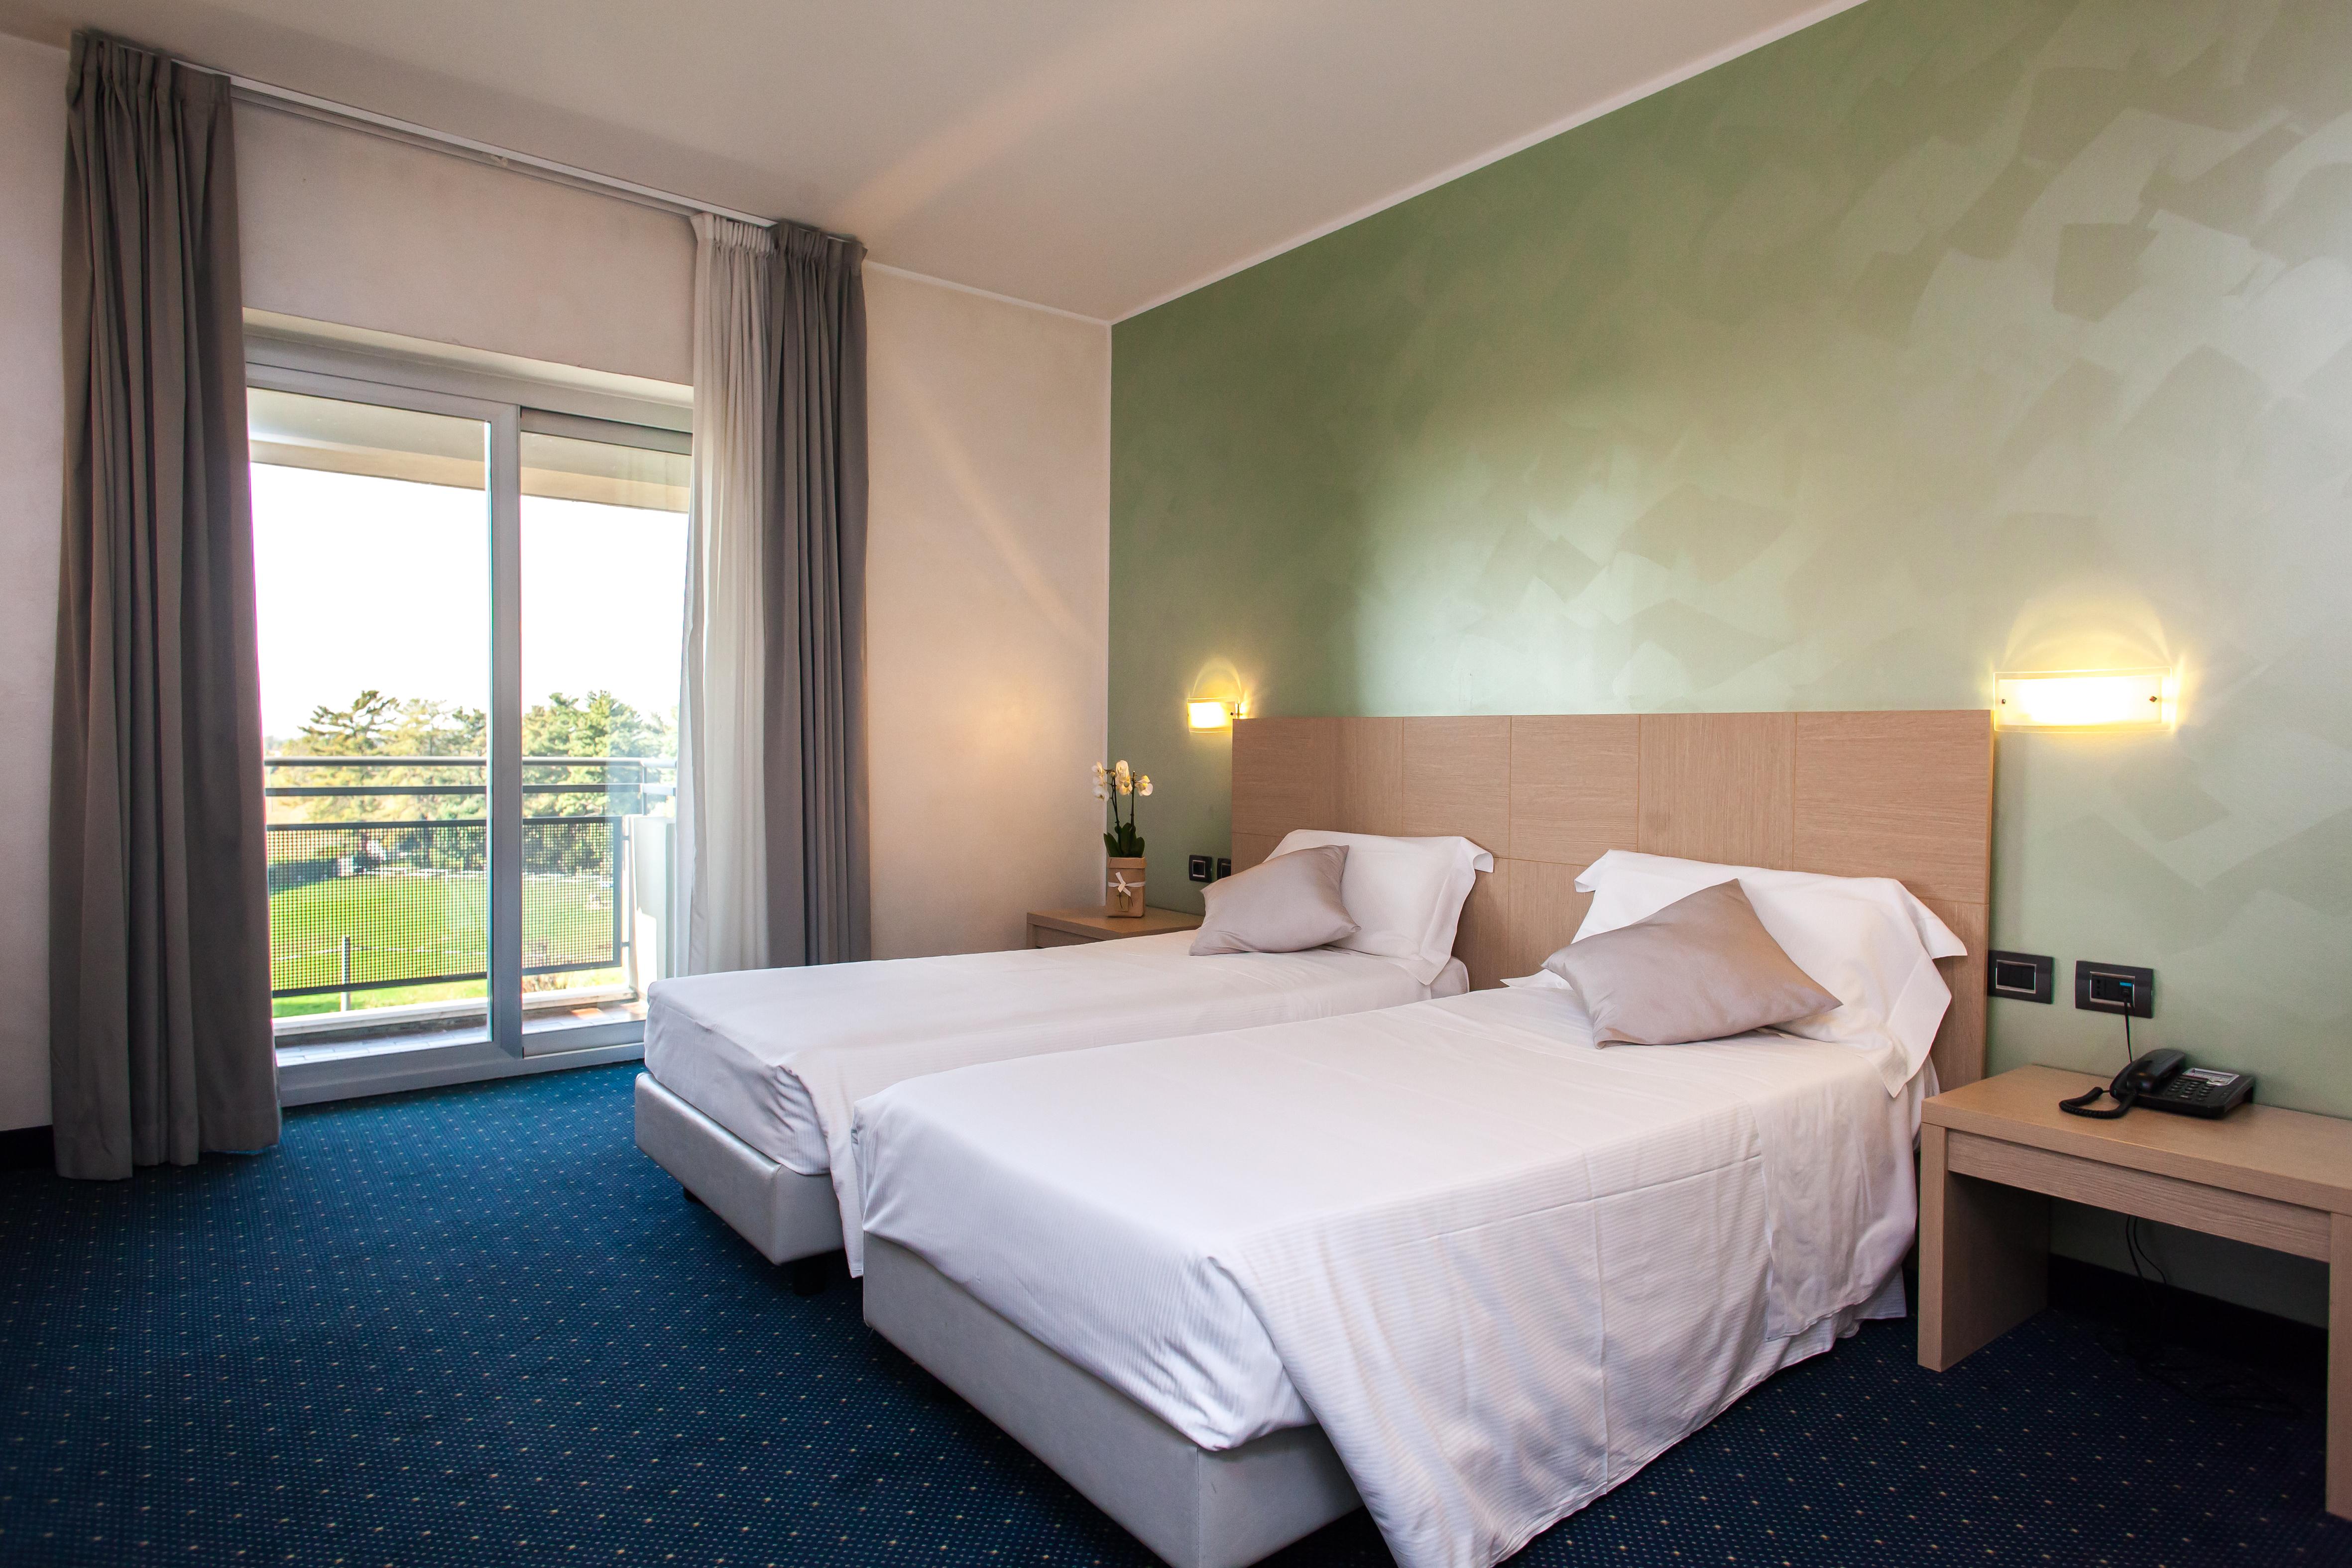 Palace_Hotel_003